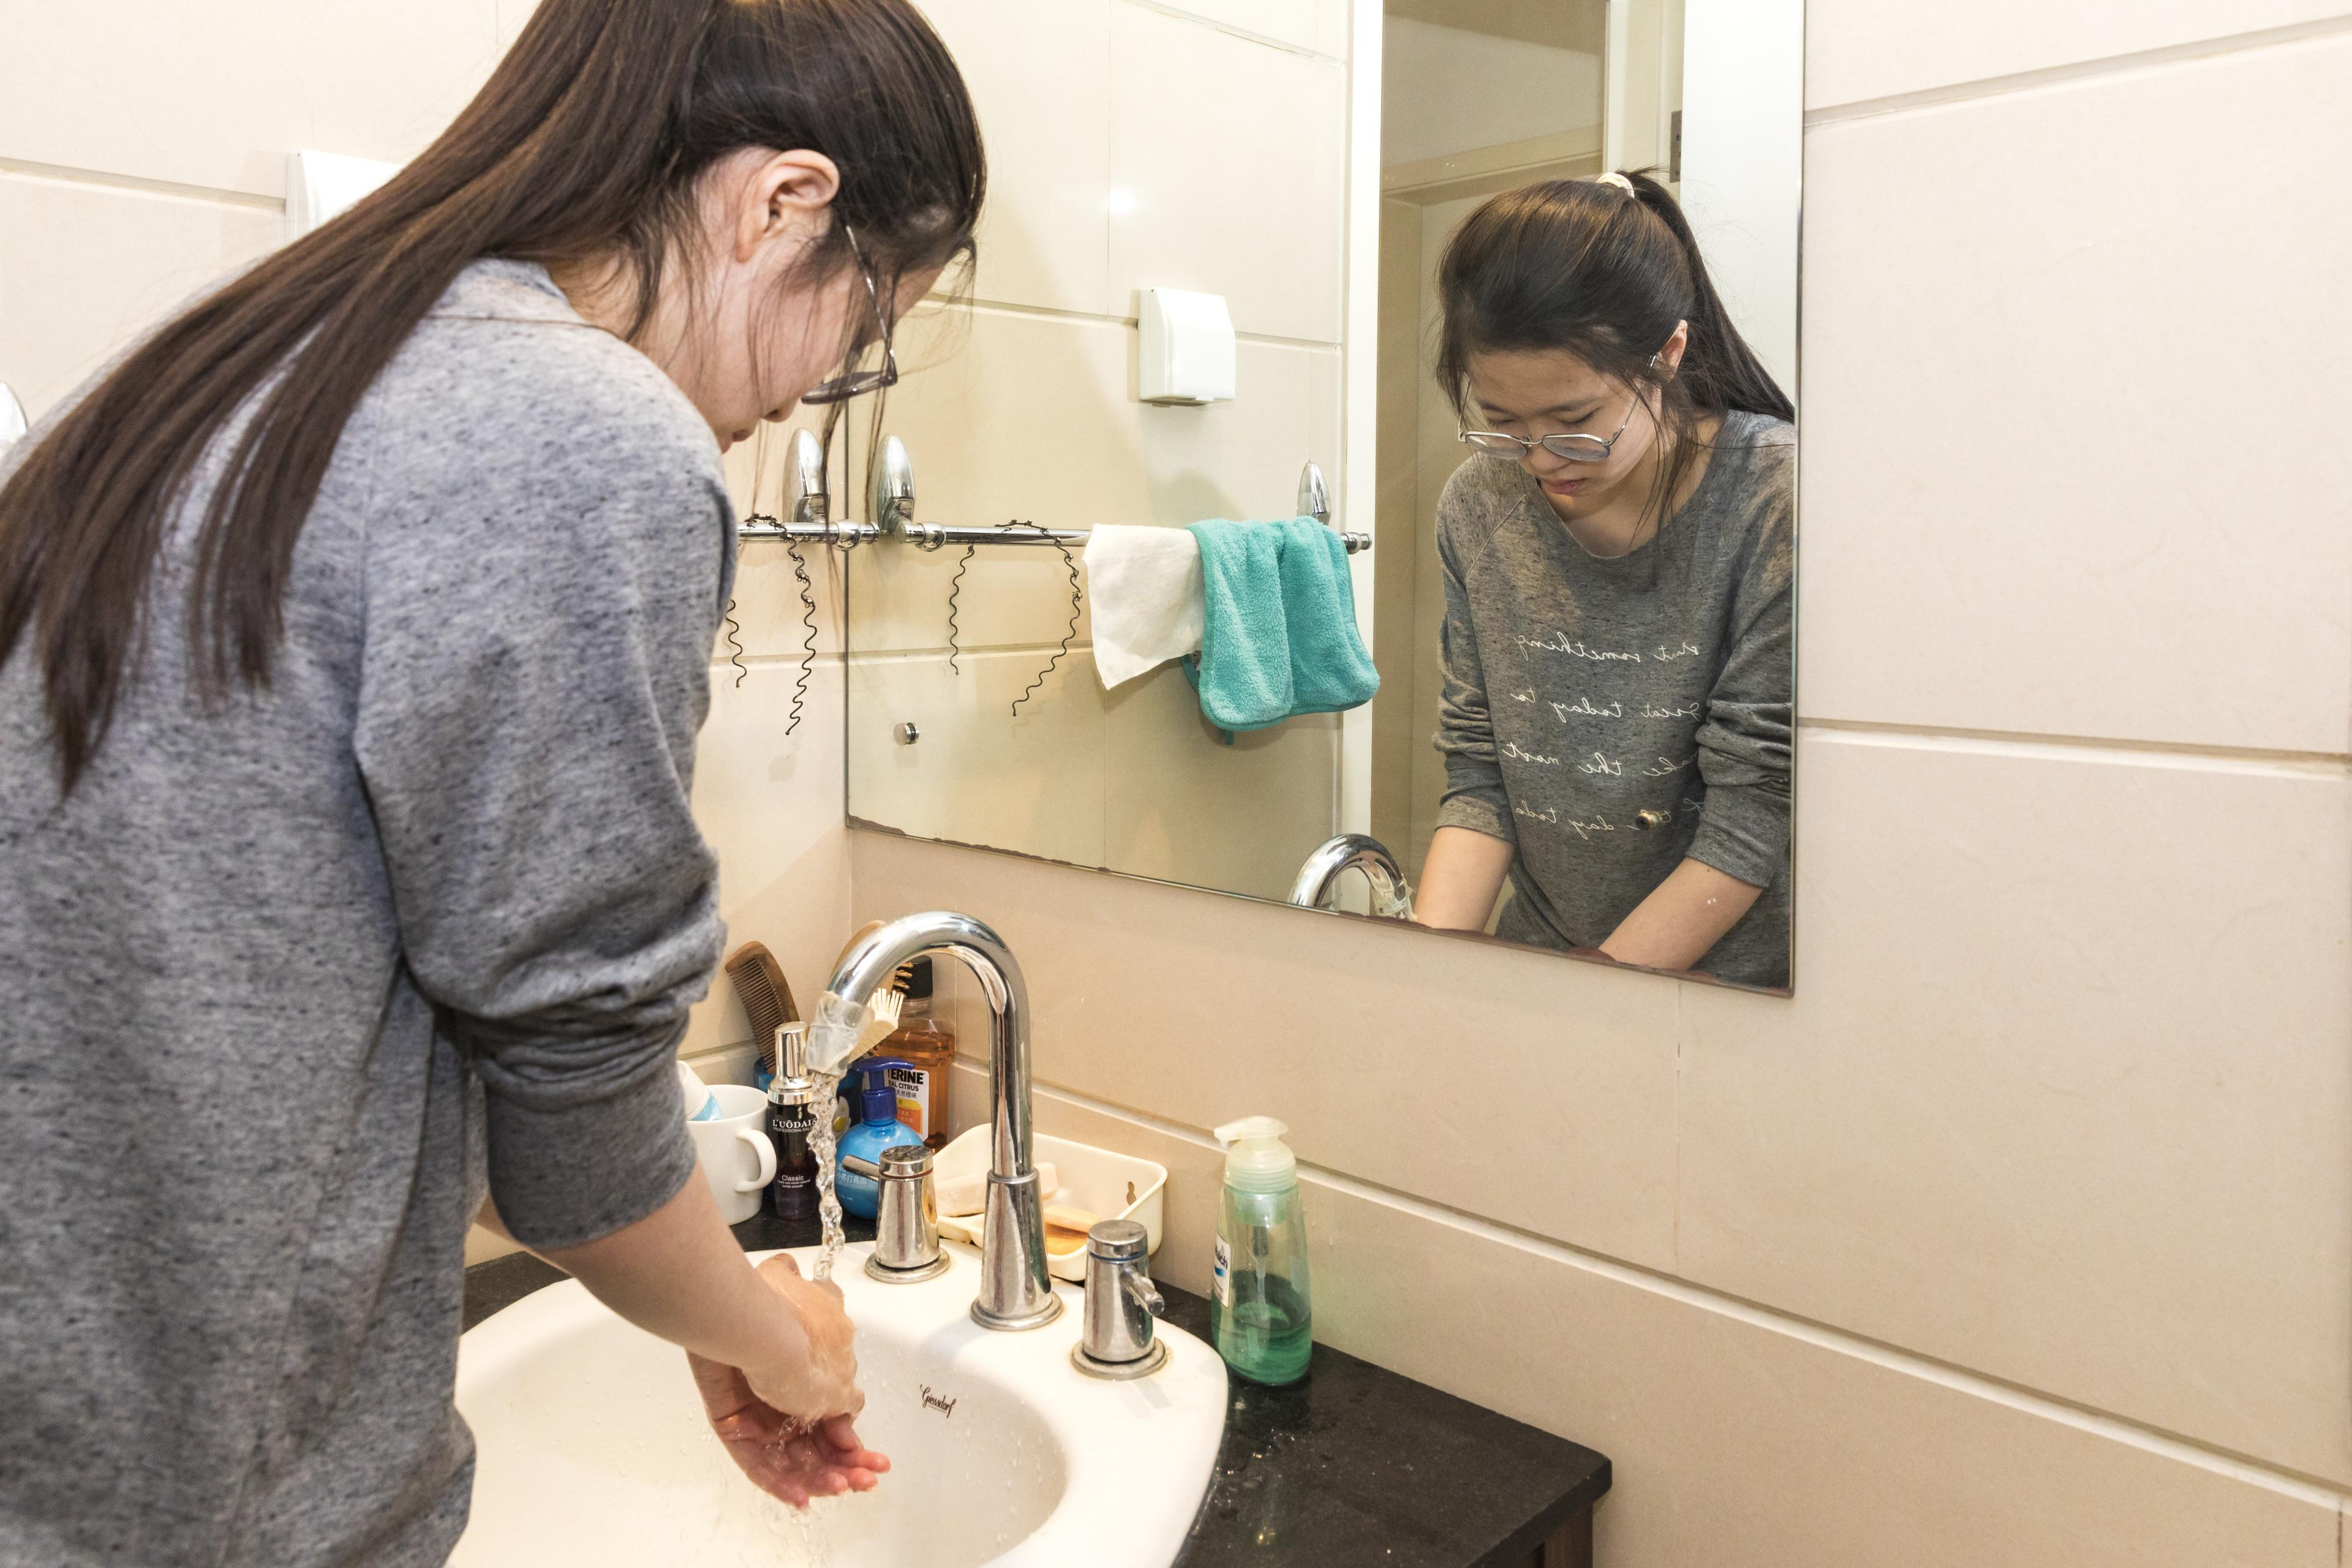 China handwashing